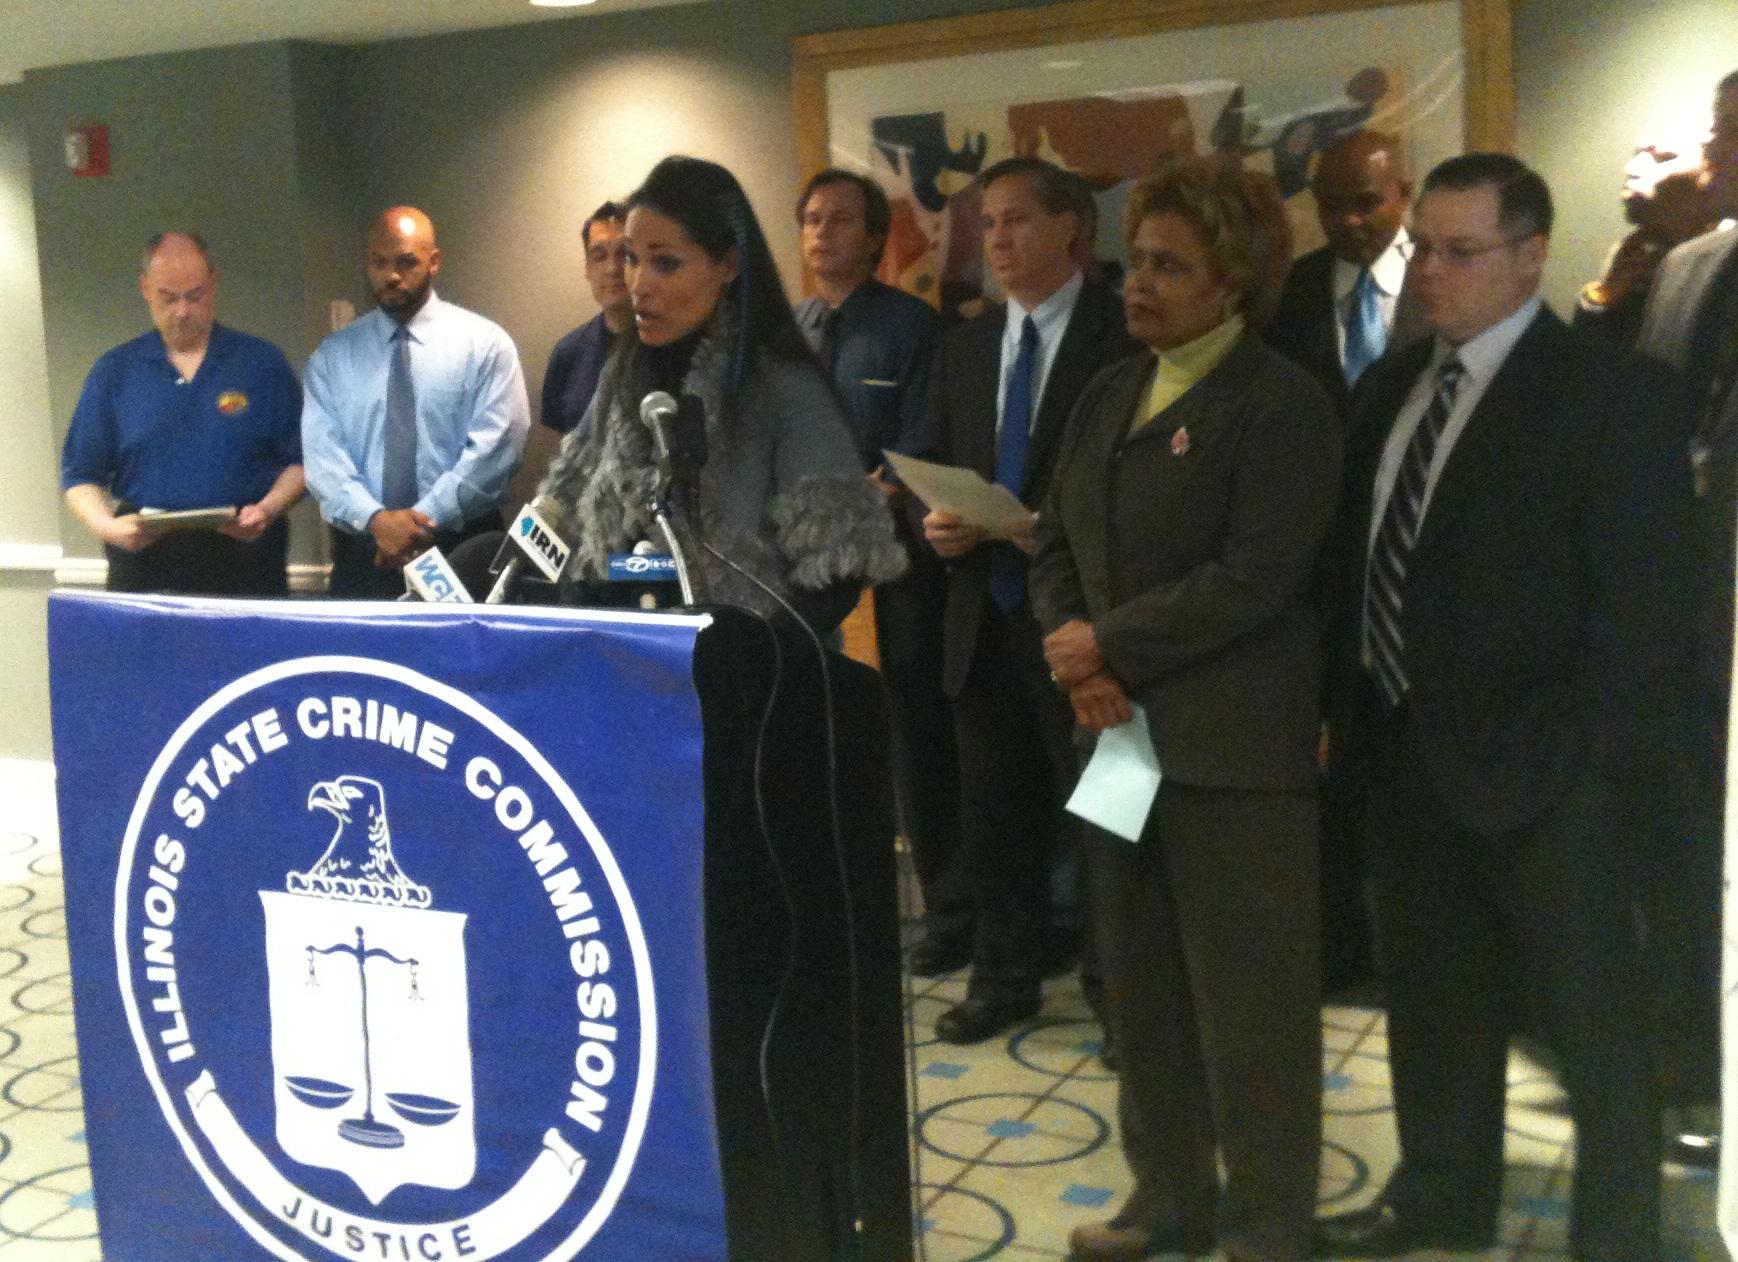 Rasheda Ali announces new anti-violence youth initiative (Judith Ruiz-Branch)